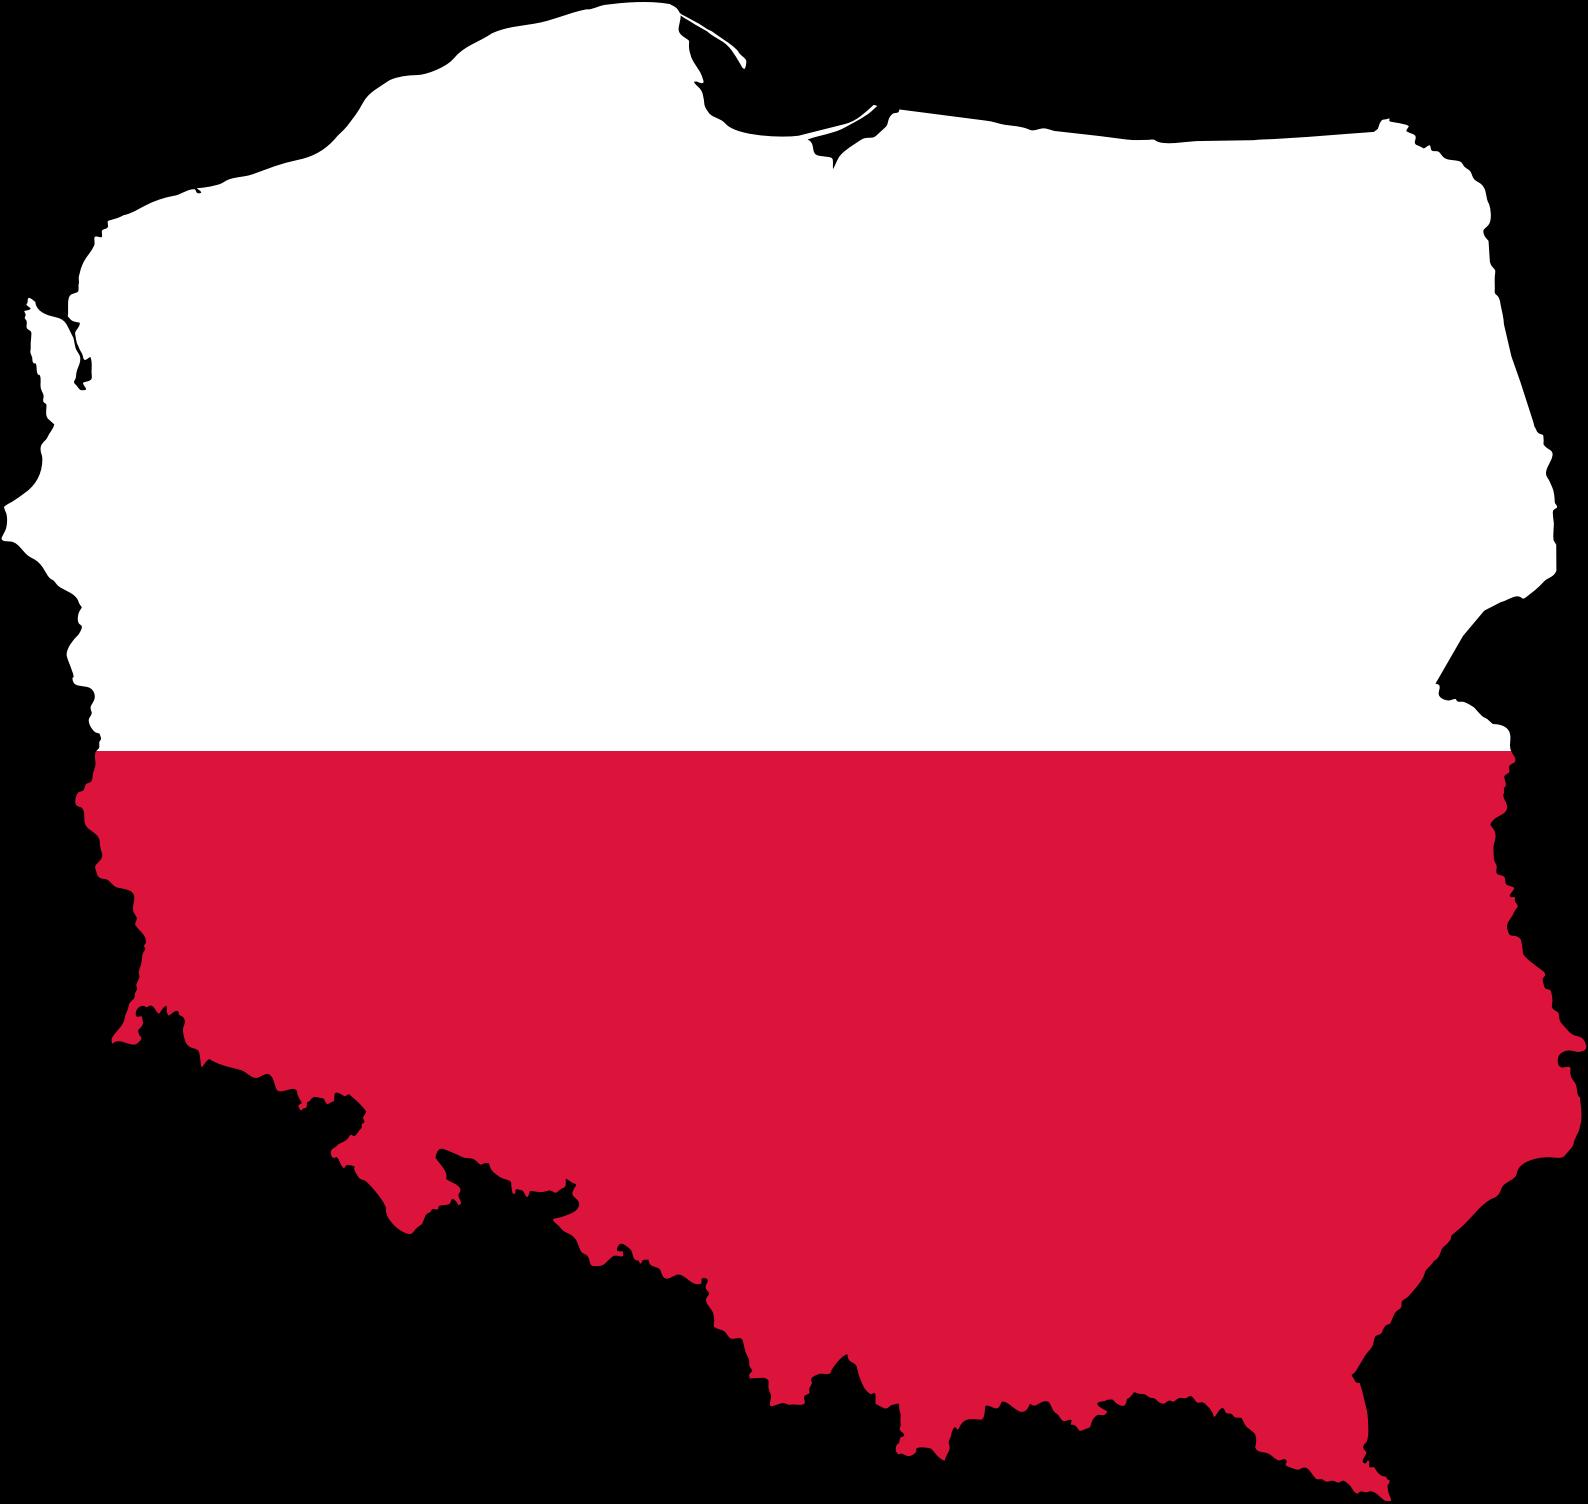 Clipart - Poland Map Flag